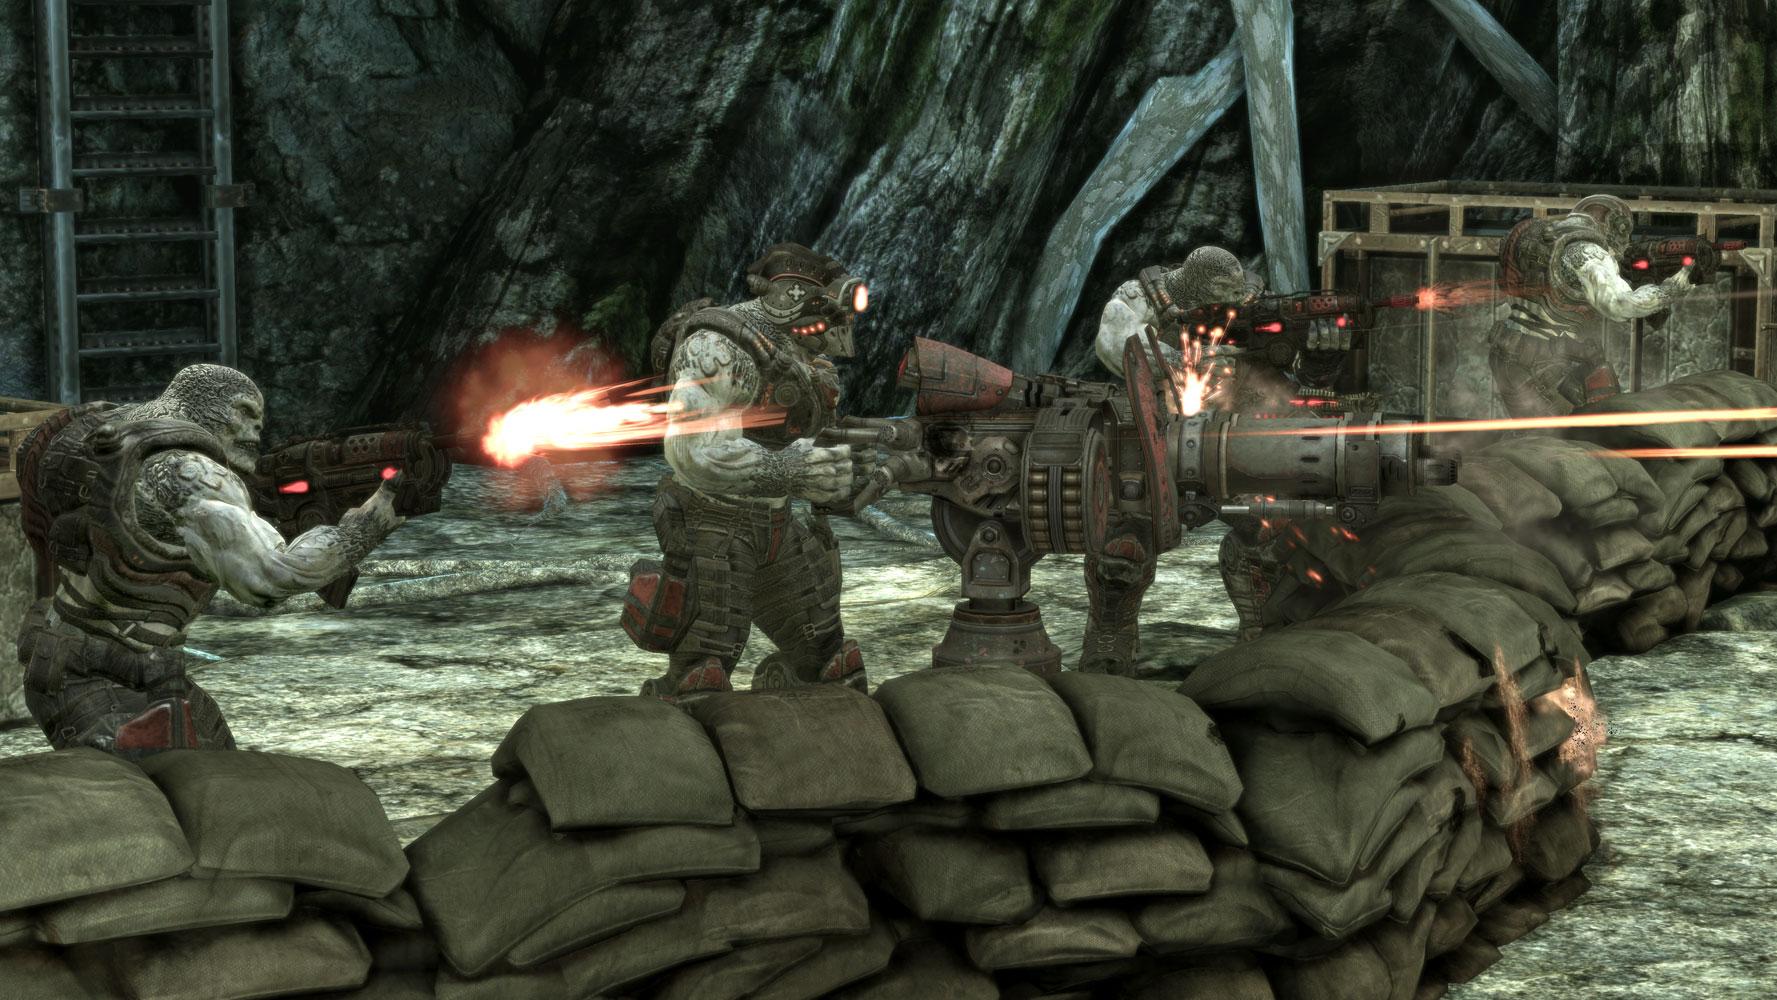 A Locust Outpost in Gears of War 2